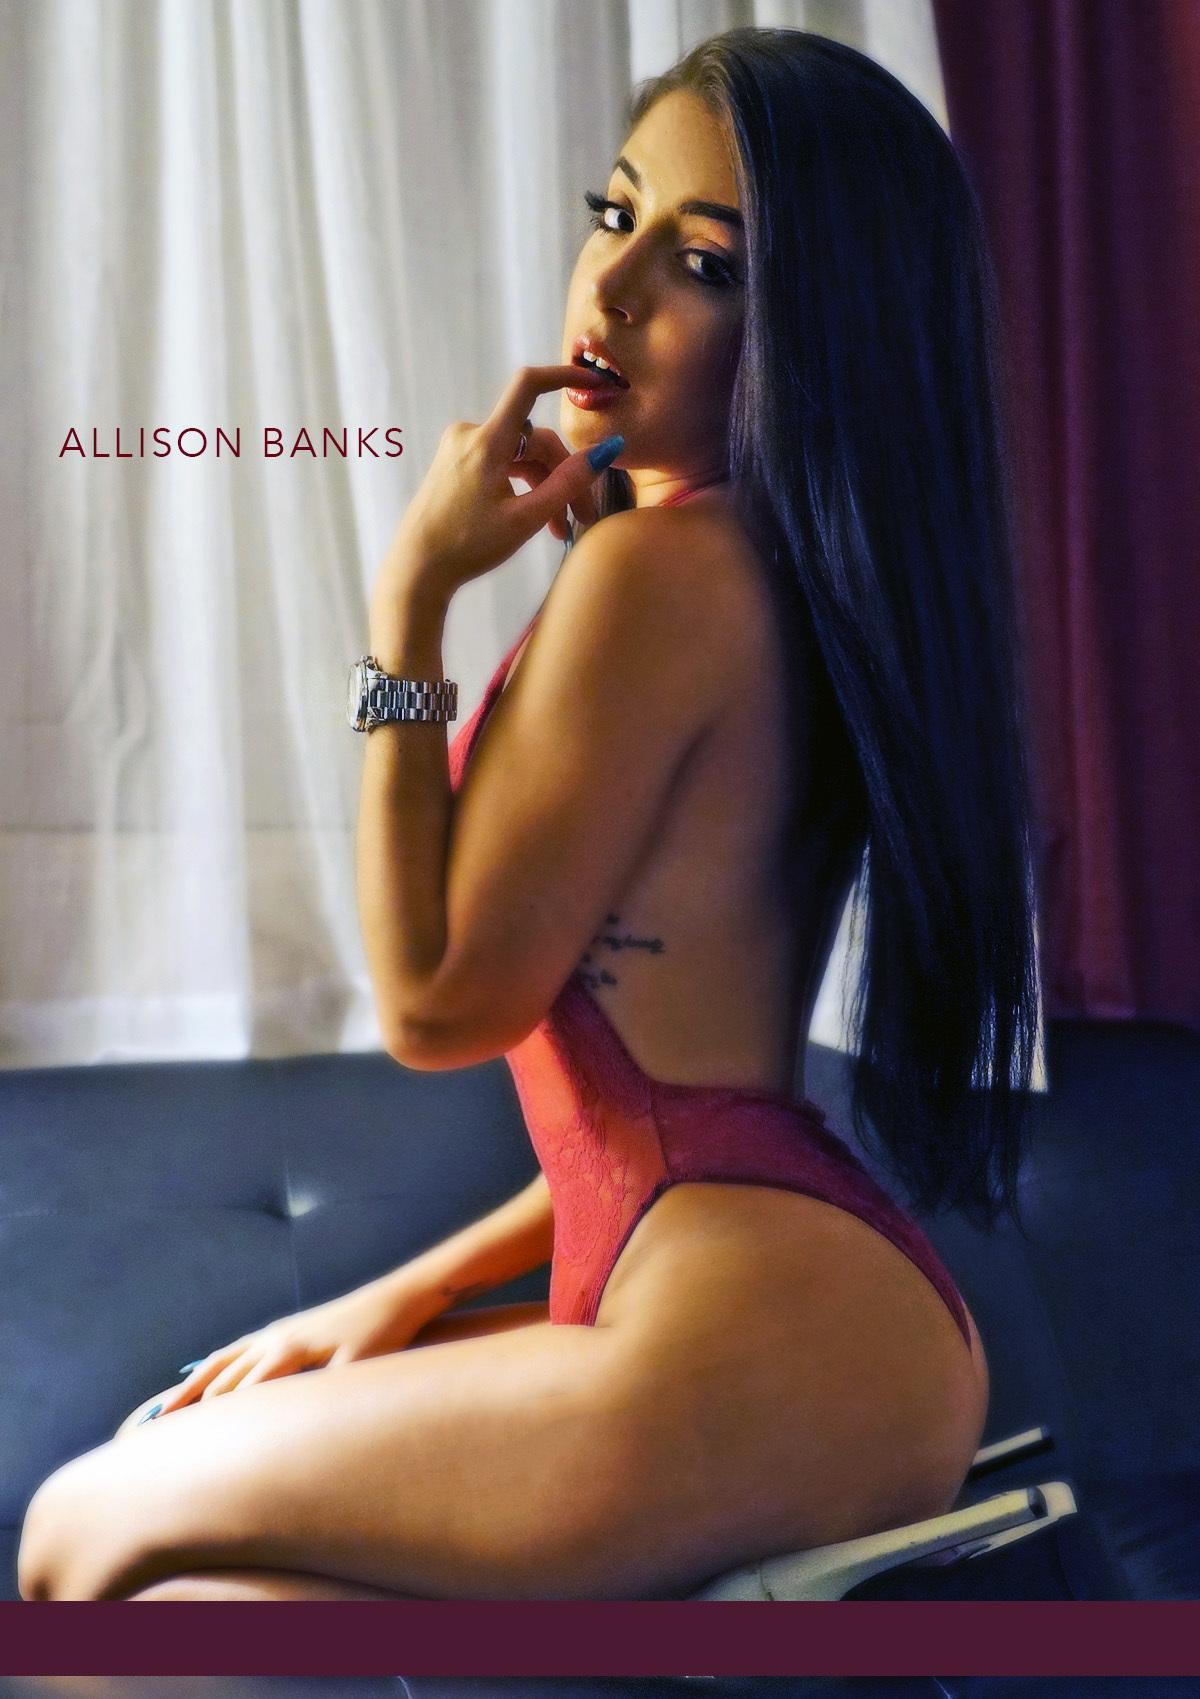 Allison Banks